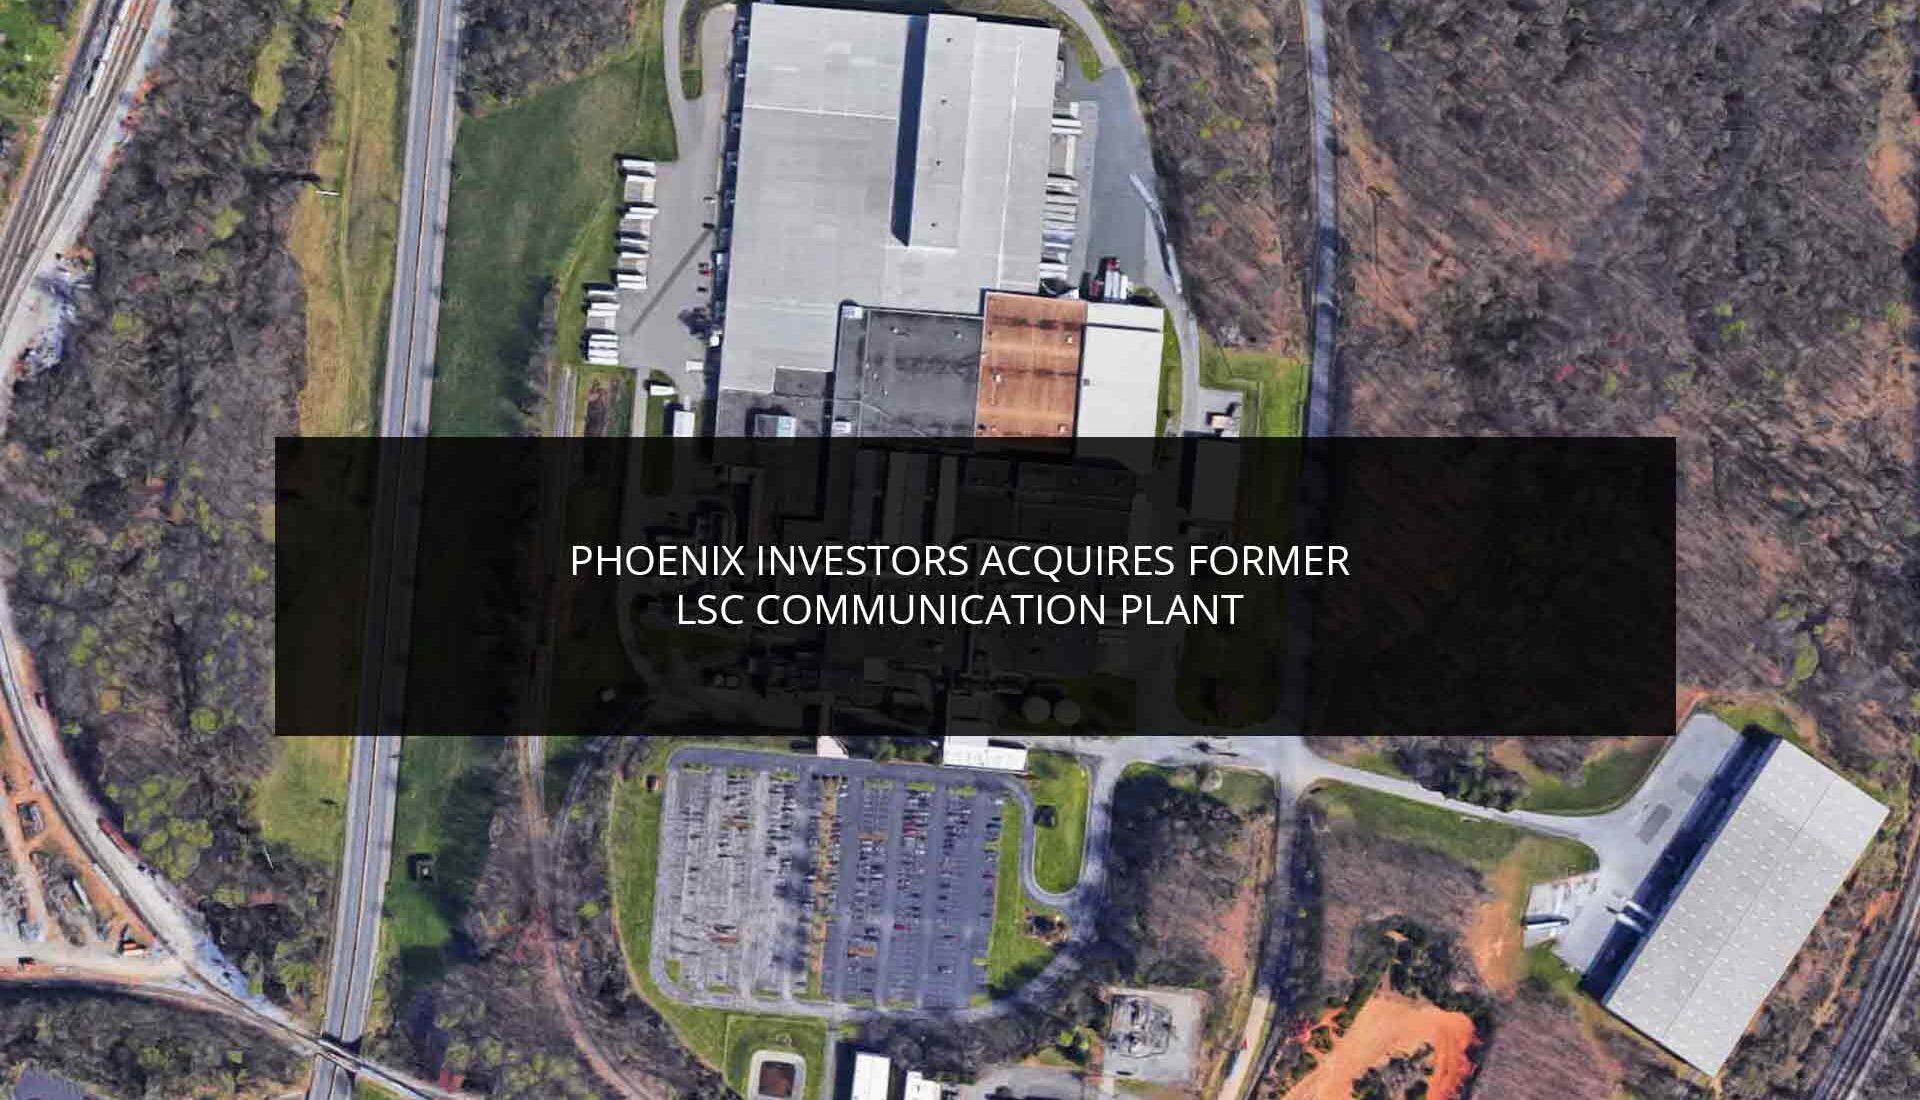 Phoenix Investors Acquires Former LSC Communication Plant